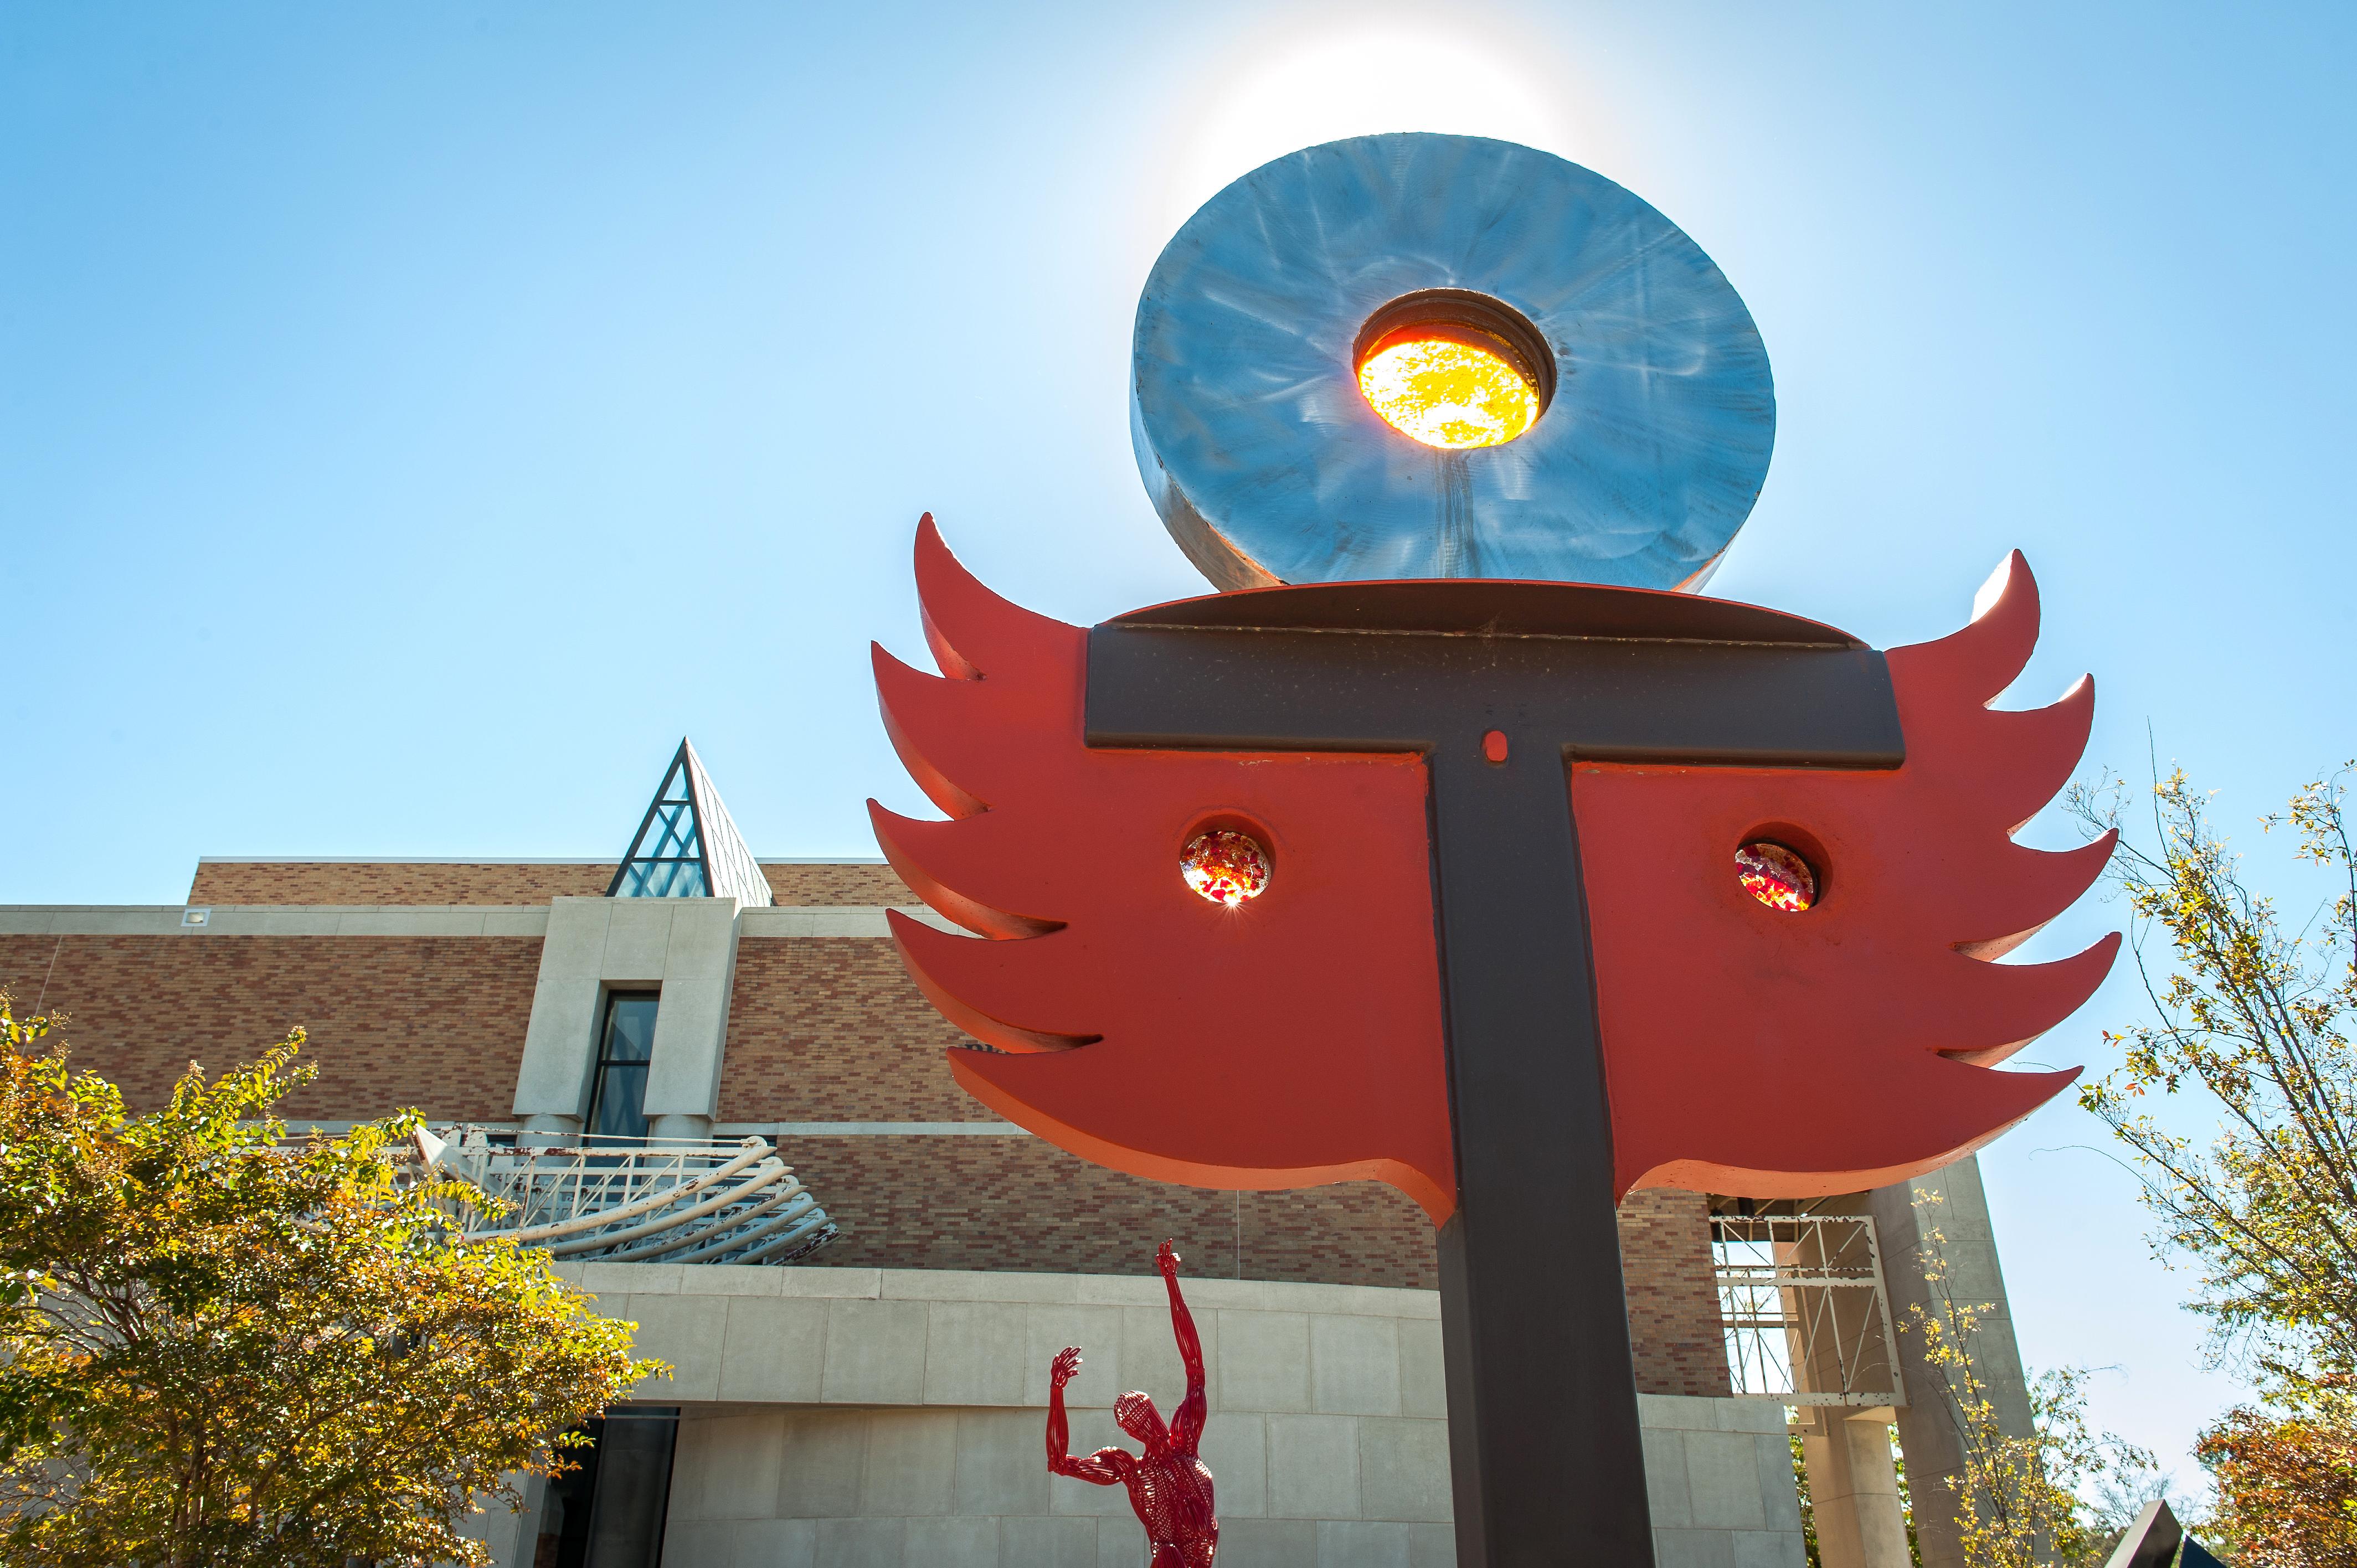 2015 BPAC sculpture garden additions-11